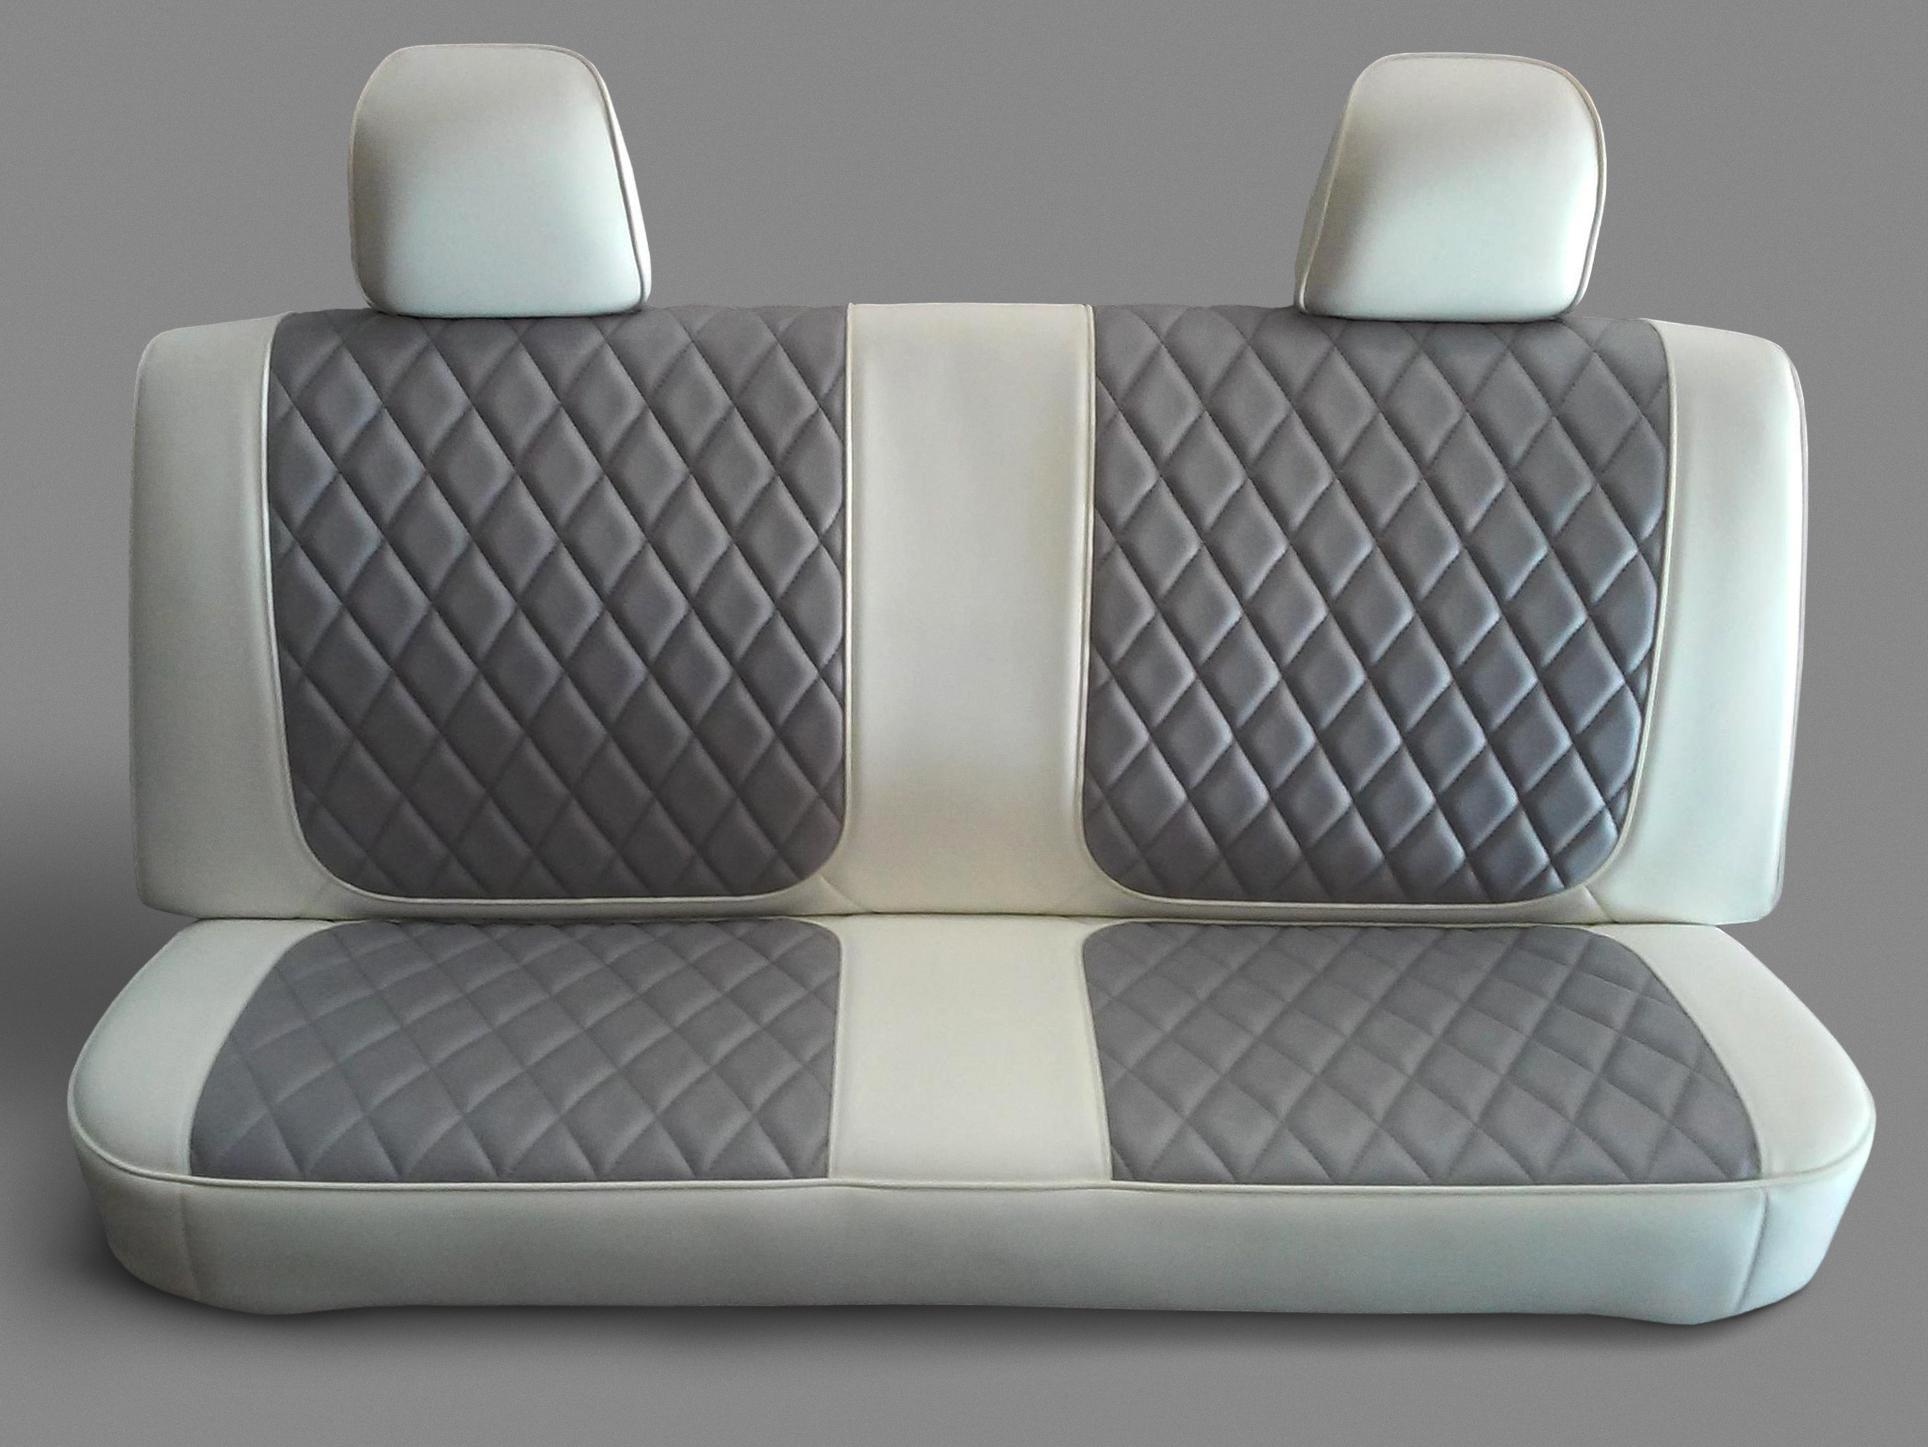 Grey-and-white-seats.jpg